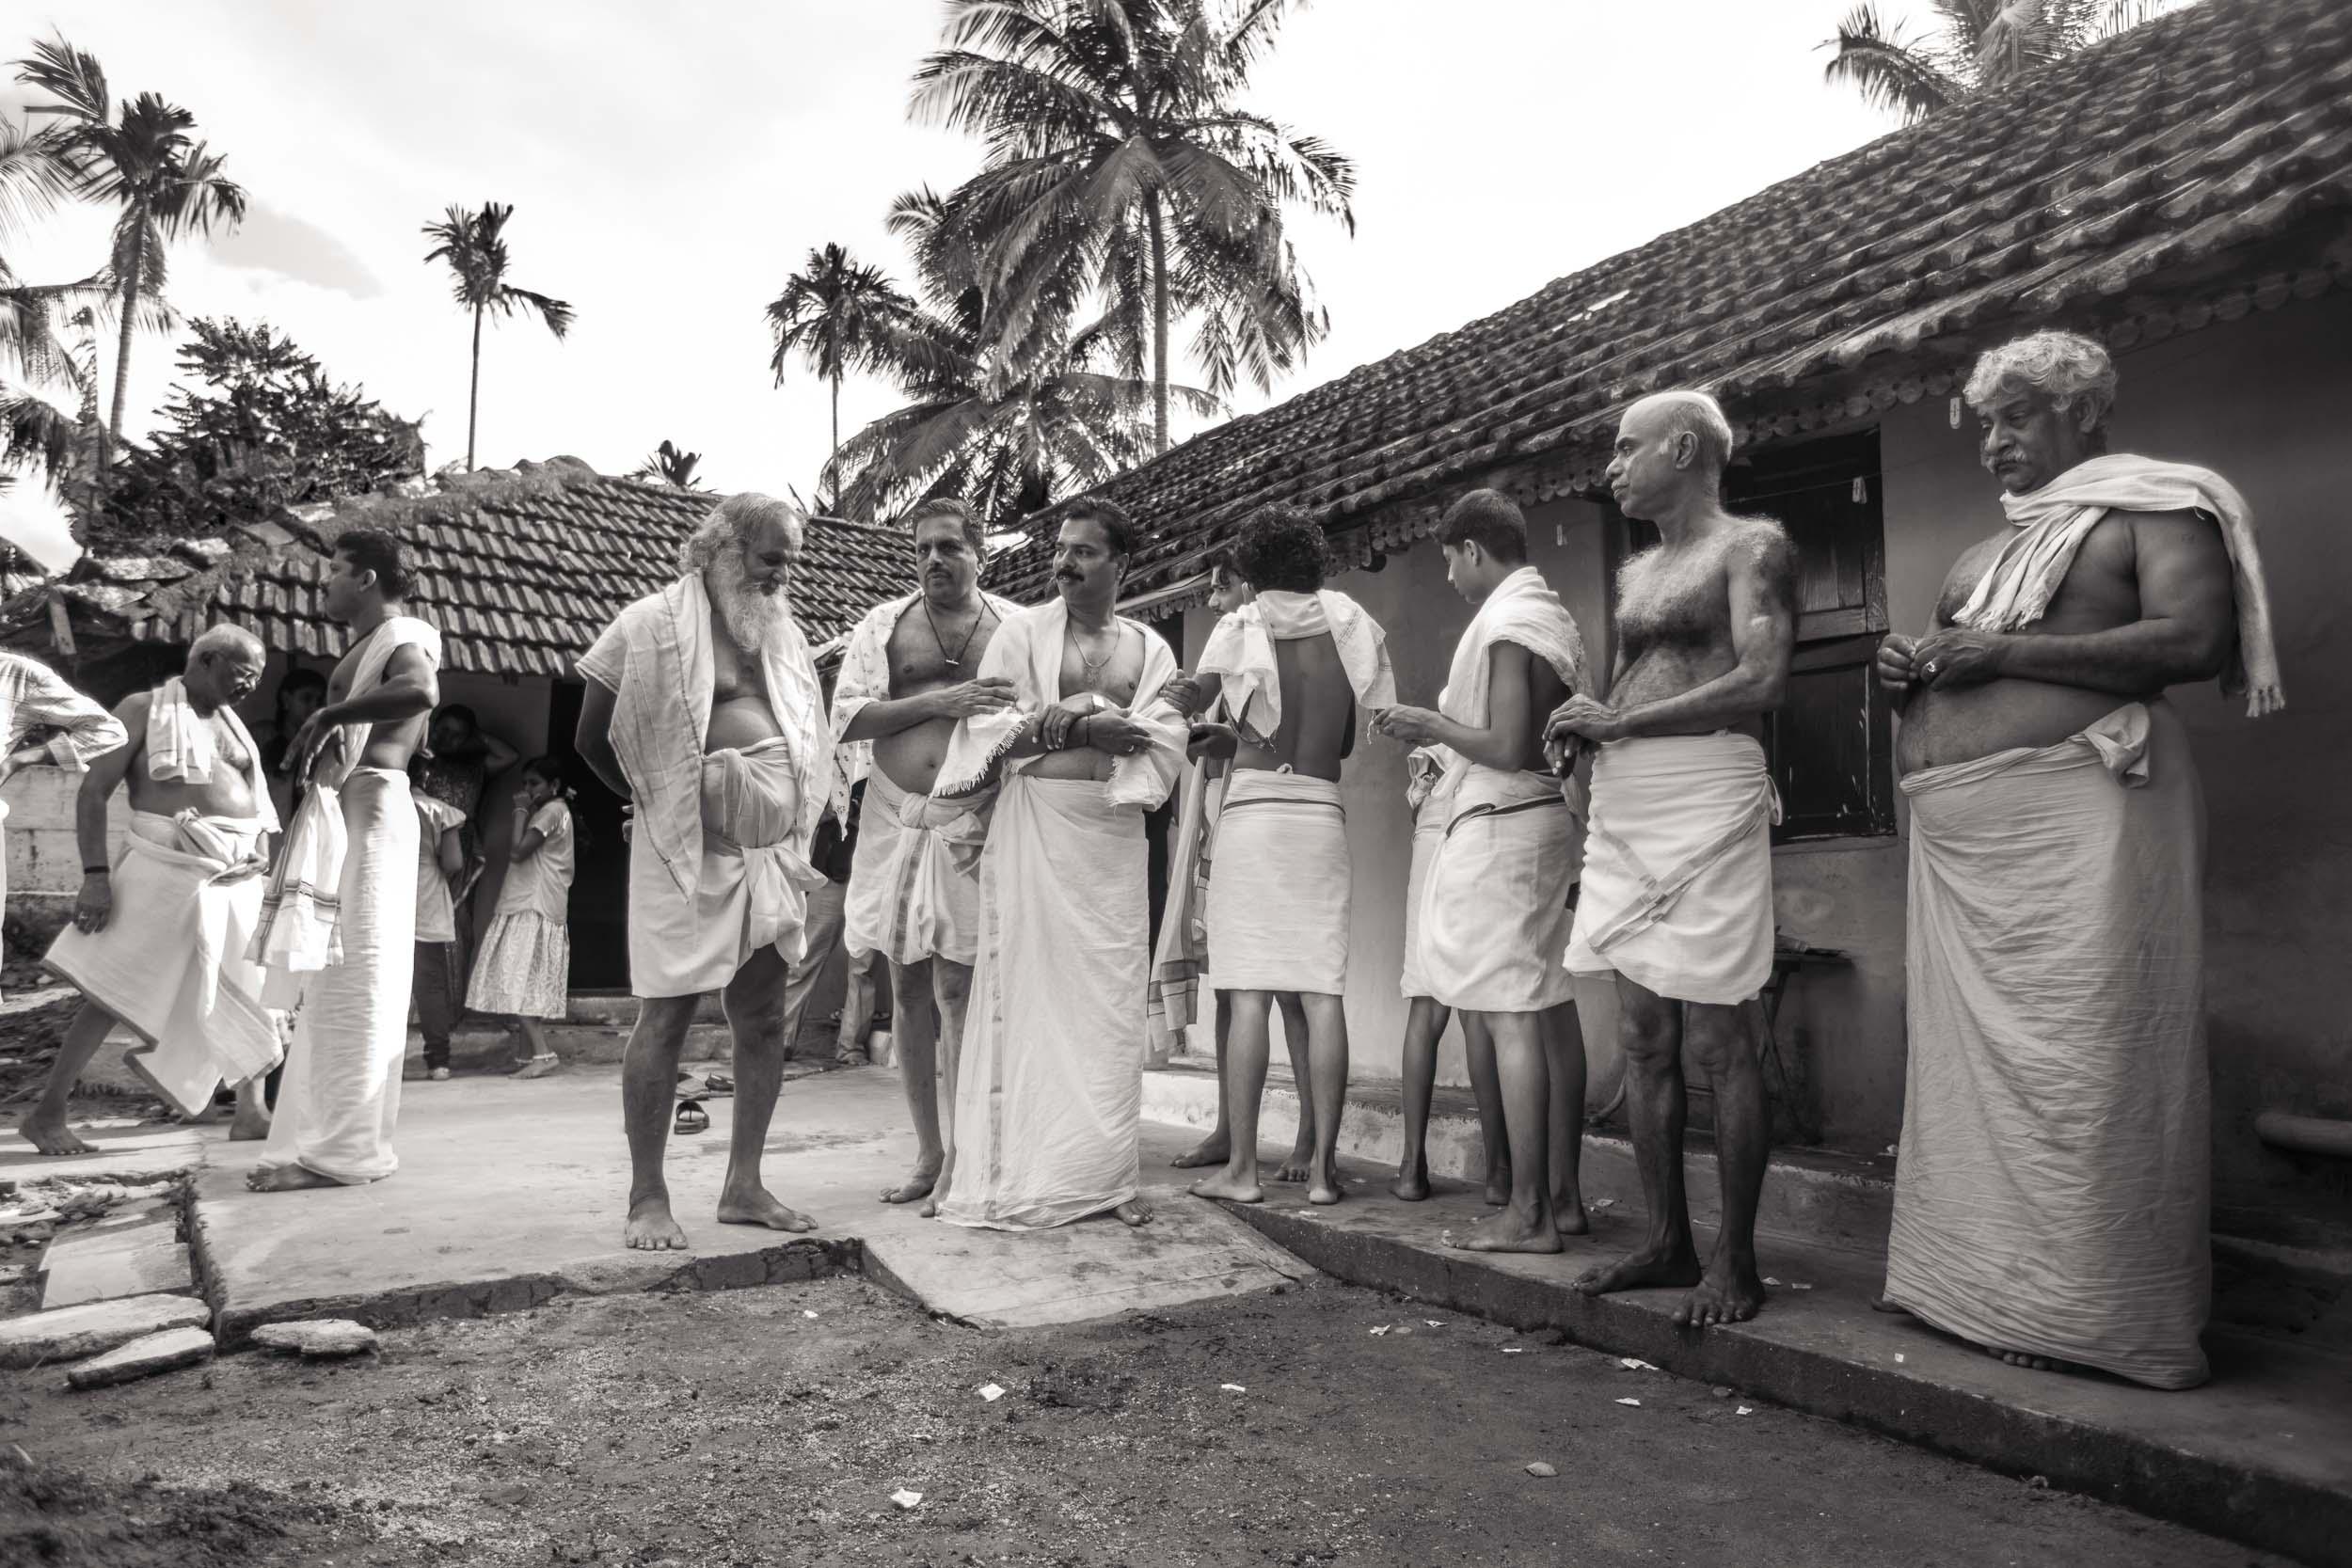 Sindhur_Photography_Travel_People_Kerala-2 copy.JPG